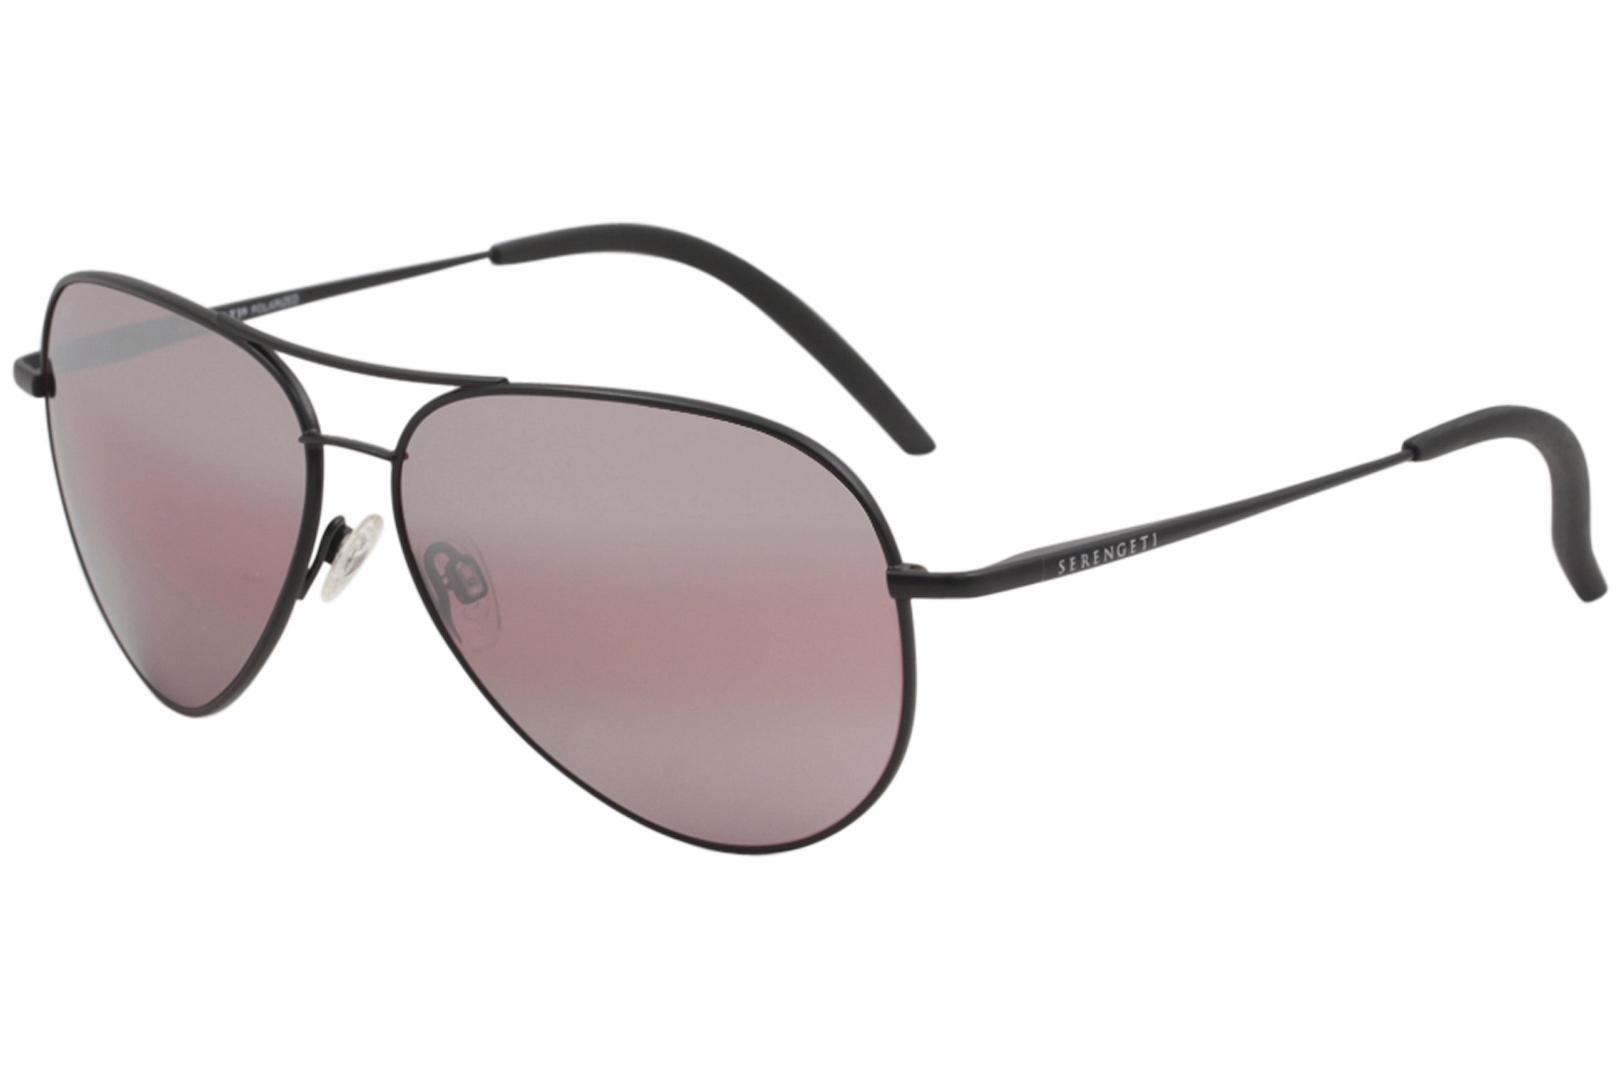 Image of Serengeti Carrara Fashion Medium Fashion Pilot Sunglasses - Black - Lens 59 Bridge 13 Temple 135mm